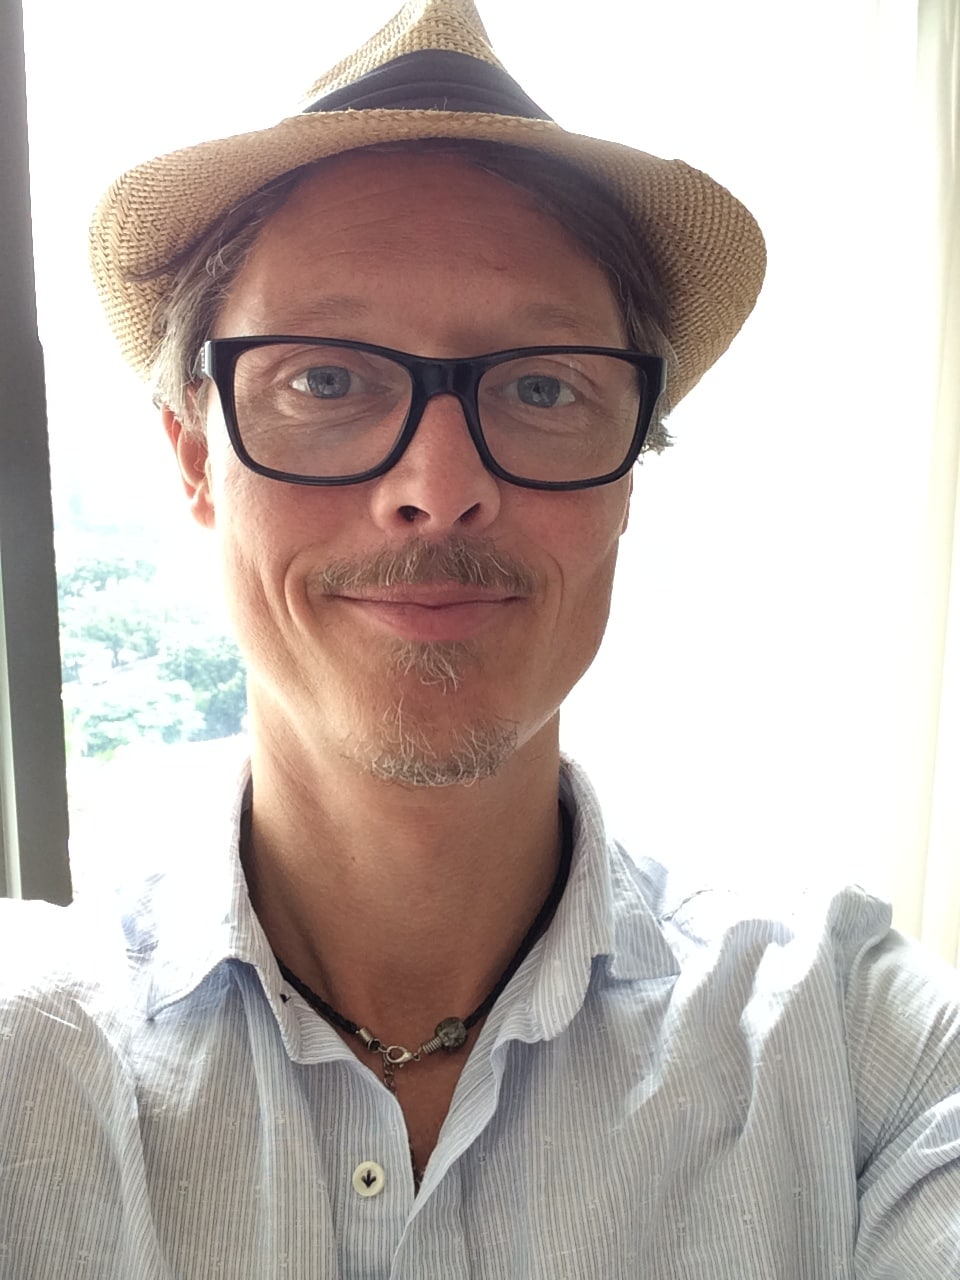 Carsten From Gentofte, Denmark